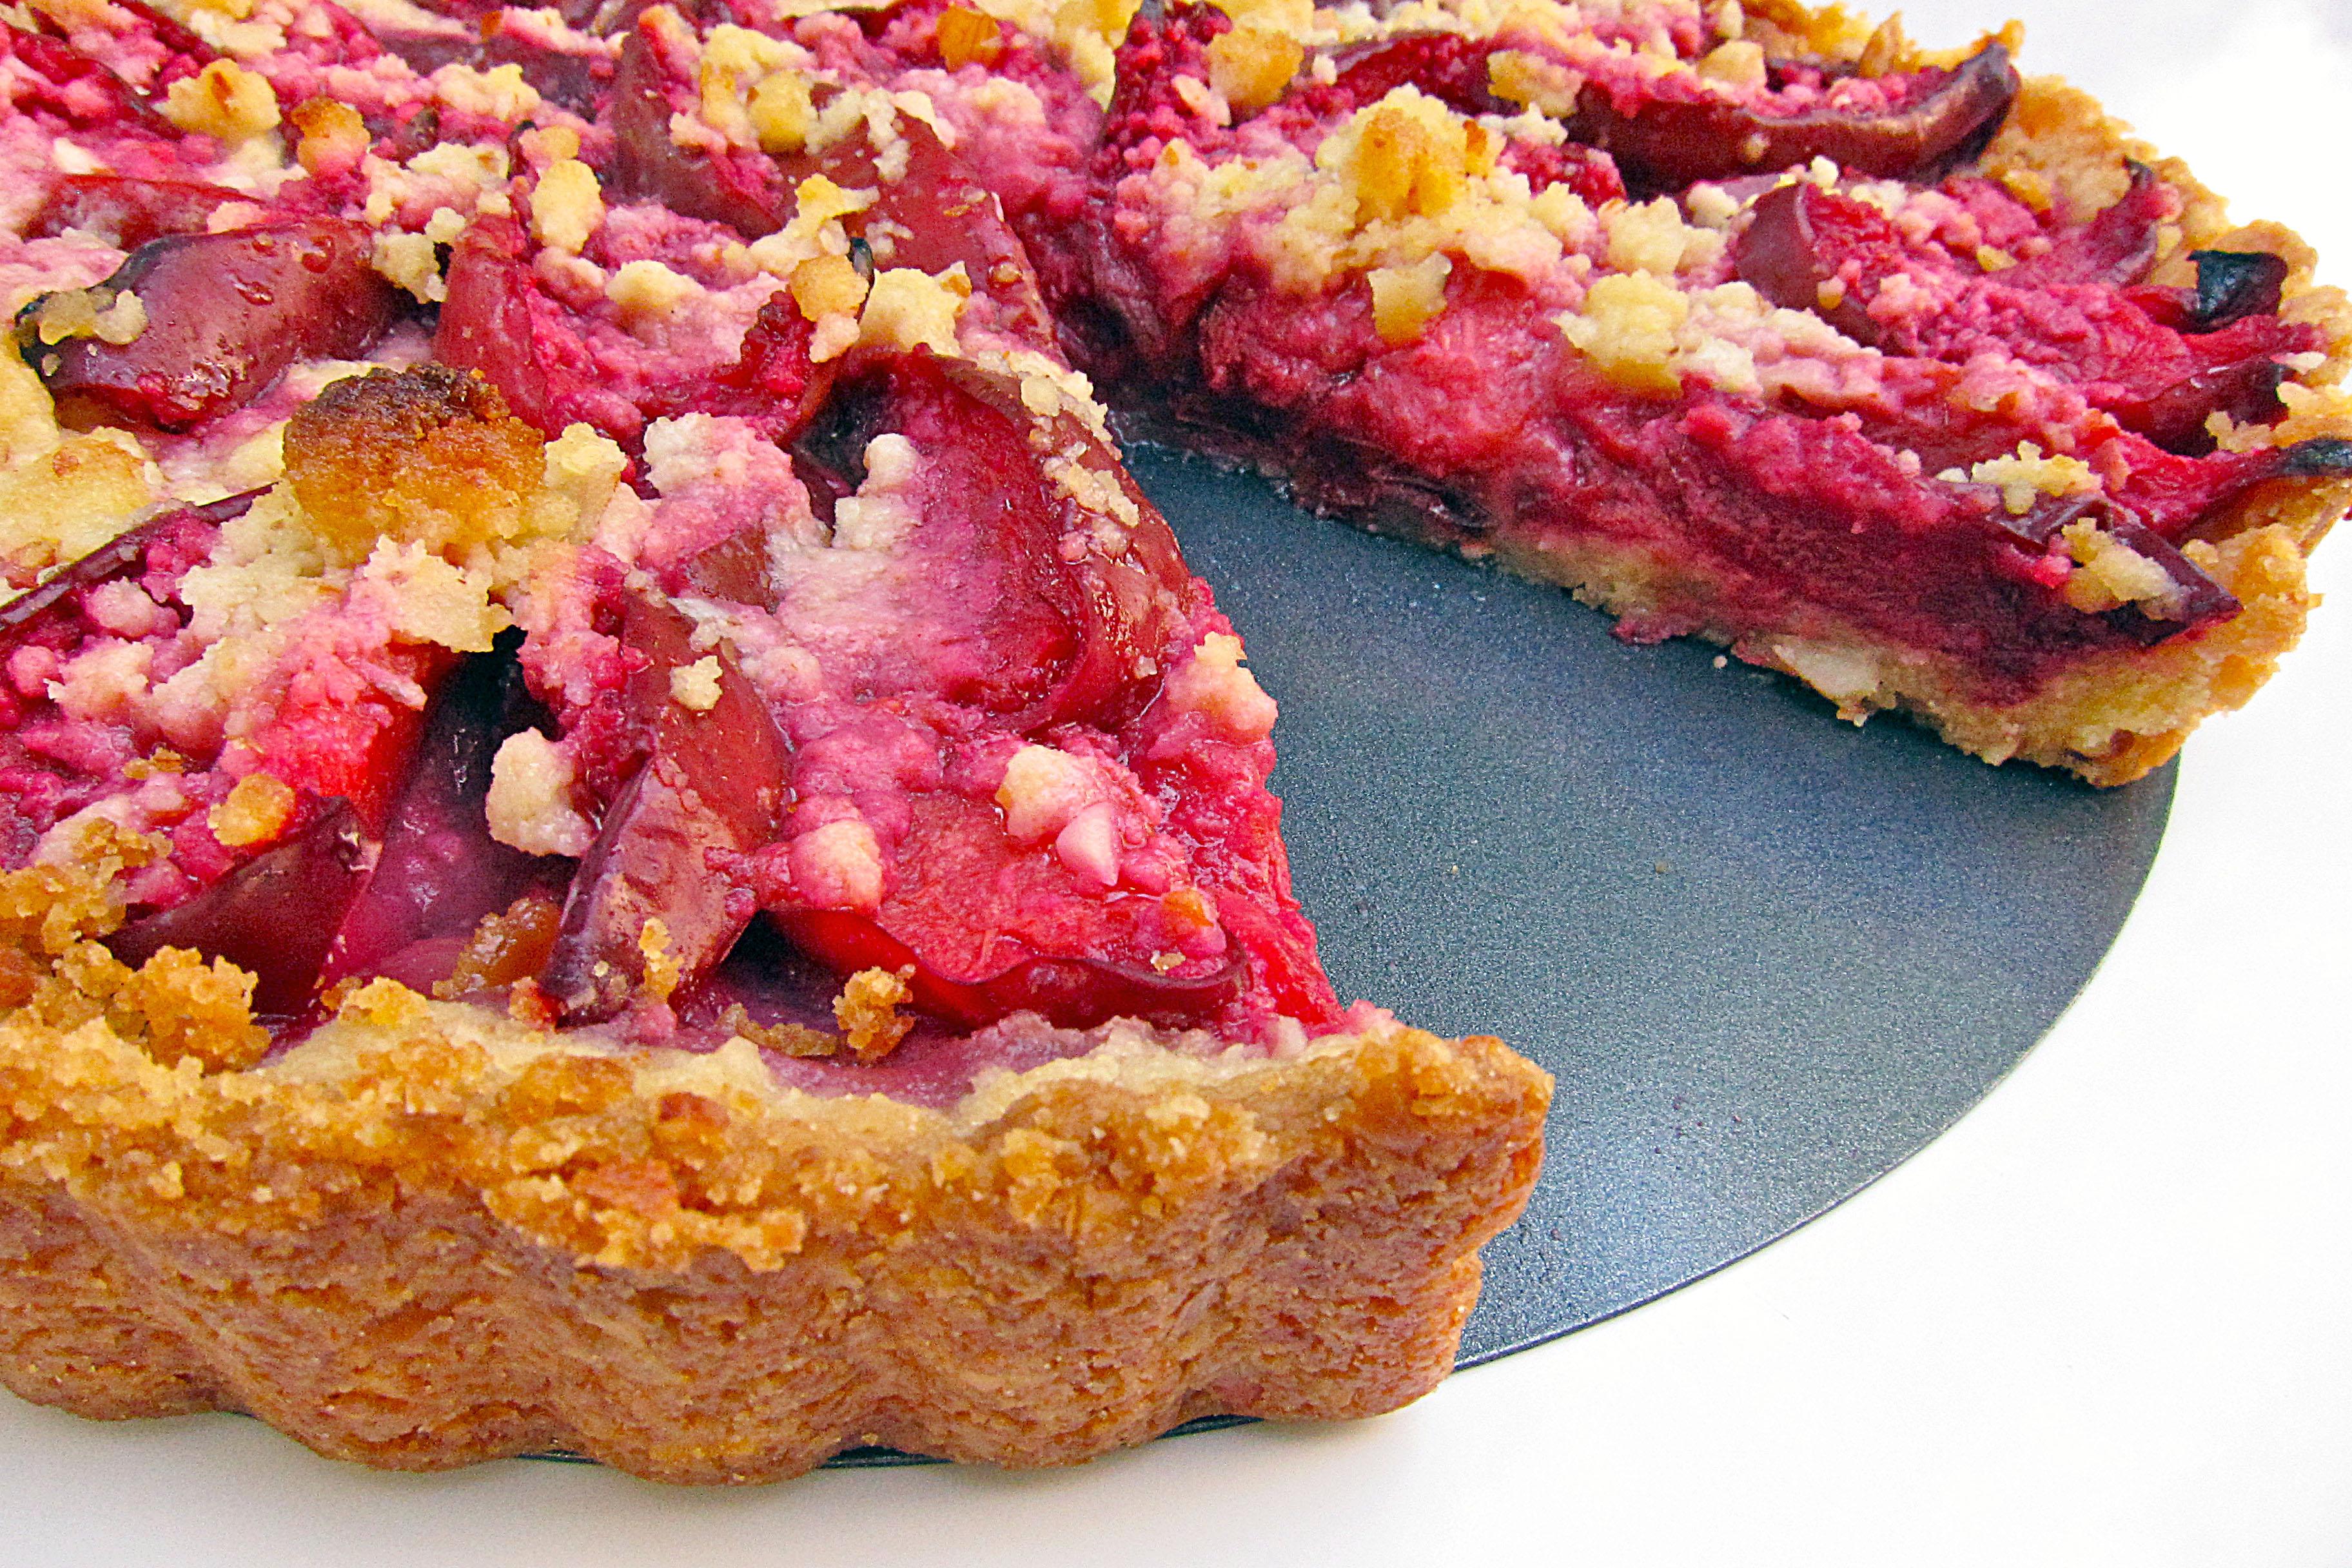 Almond Plum Tart: A Delicious Homemade Plum Pie Recipe